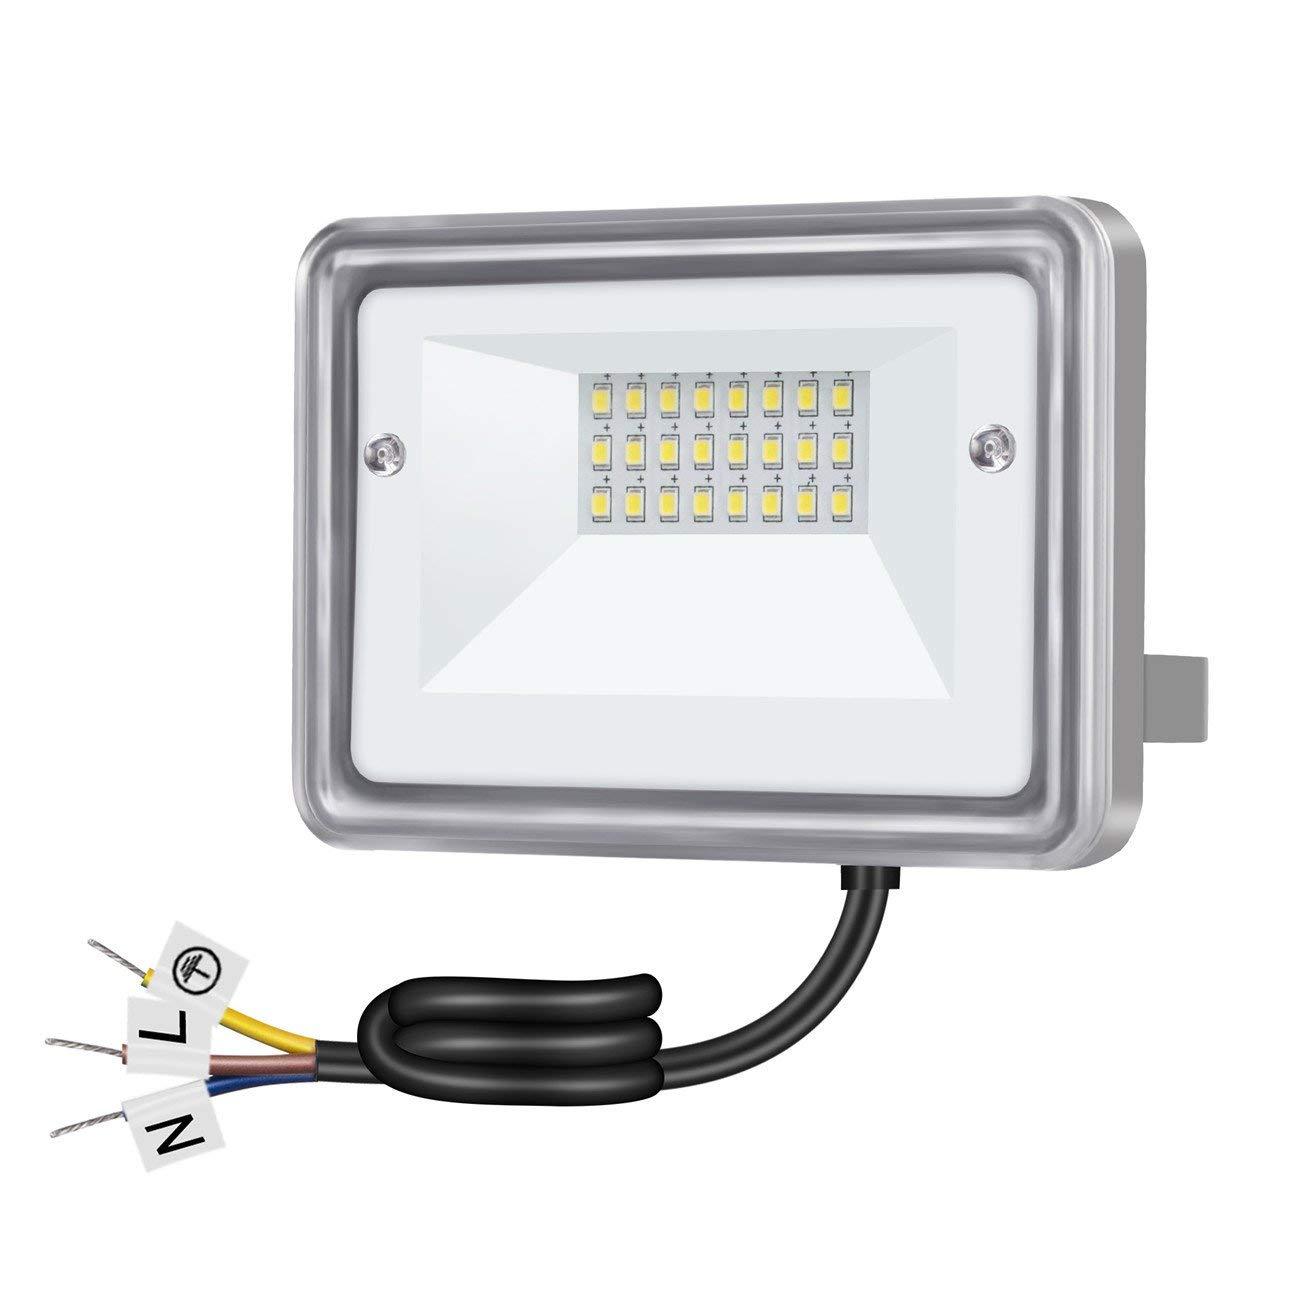 For Garden Spotlight Outdoor 100W Flood Light Yard LED Floodlight Lamp US Plug